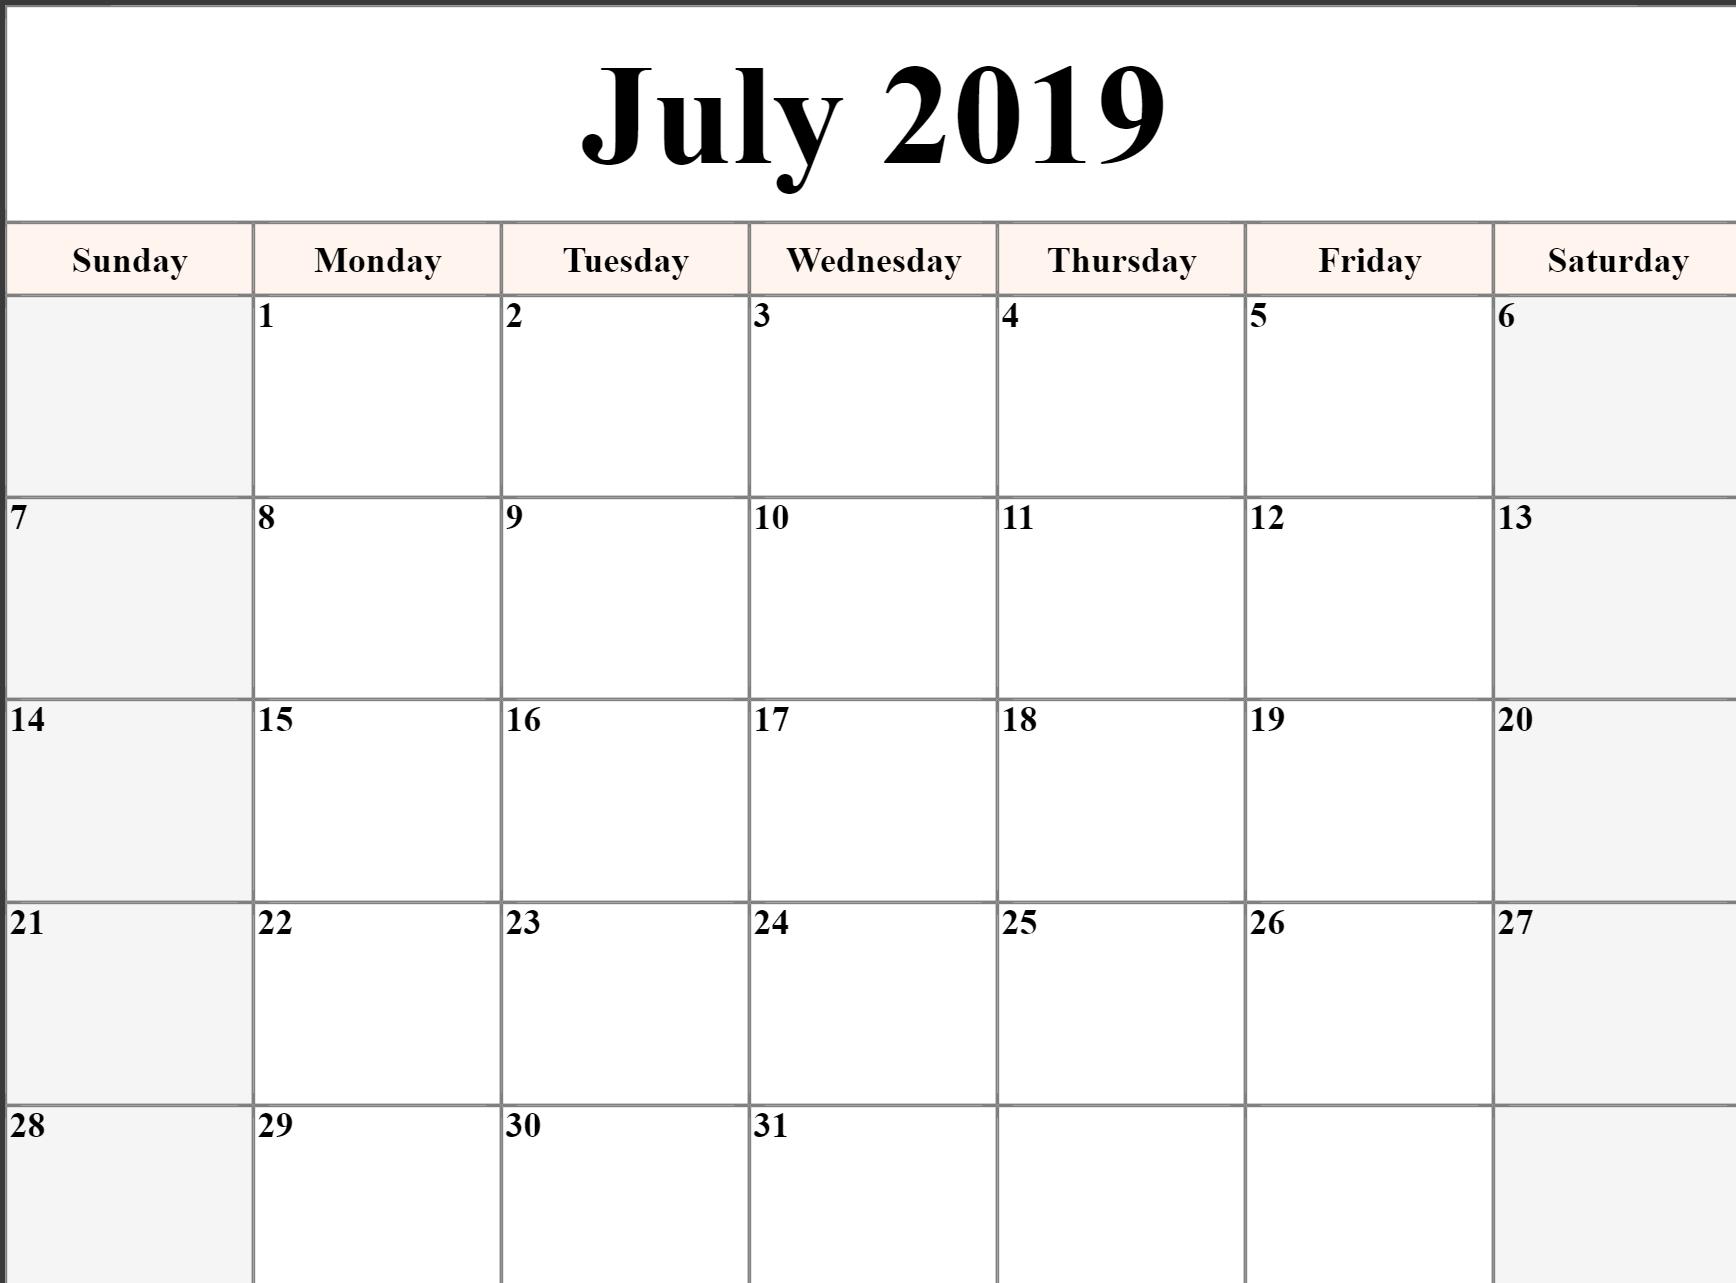 Free Printable July 2019 Calendar Download - Free Printable-Printable Monthly Calendars For June And July